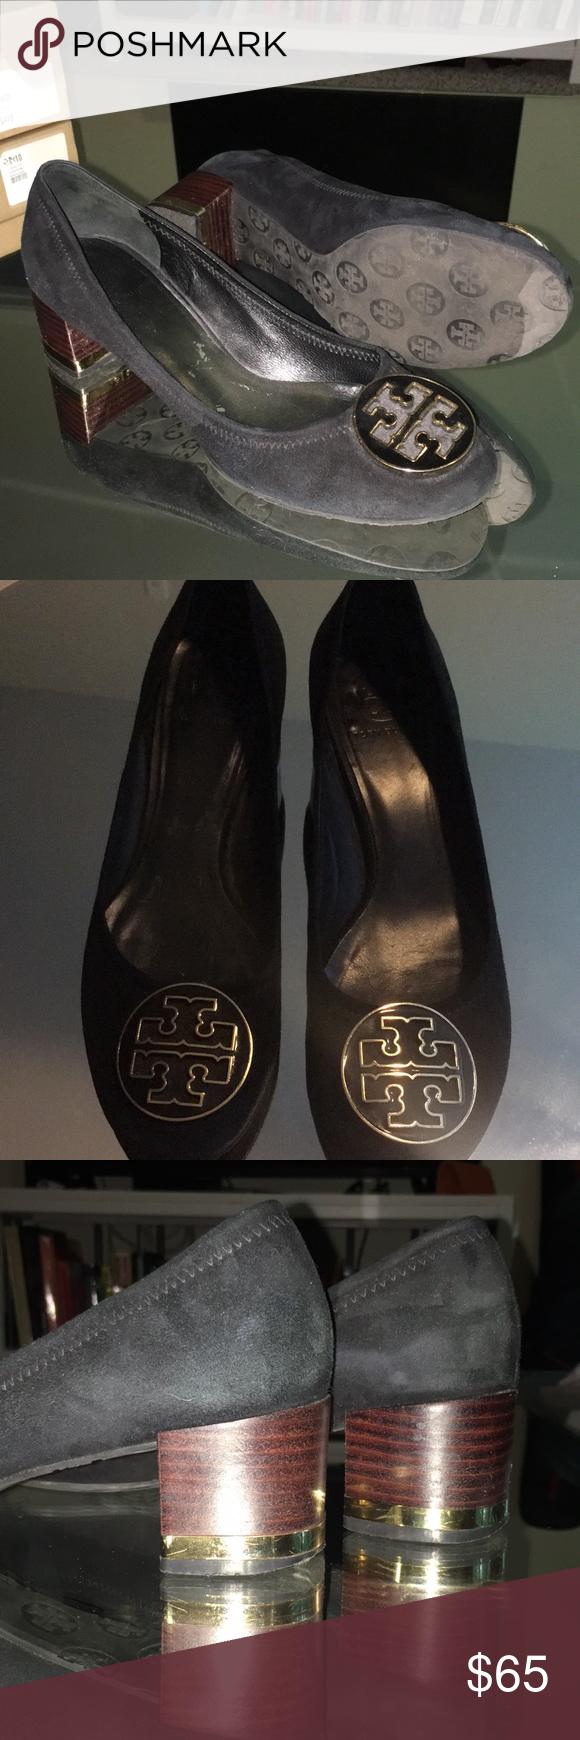 07e989abcb288d Tory Burch Heels GUC Tory chunky heel. Lots of life still left!  Comfortable